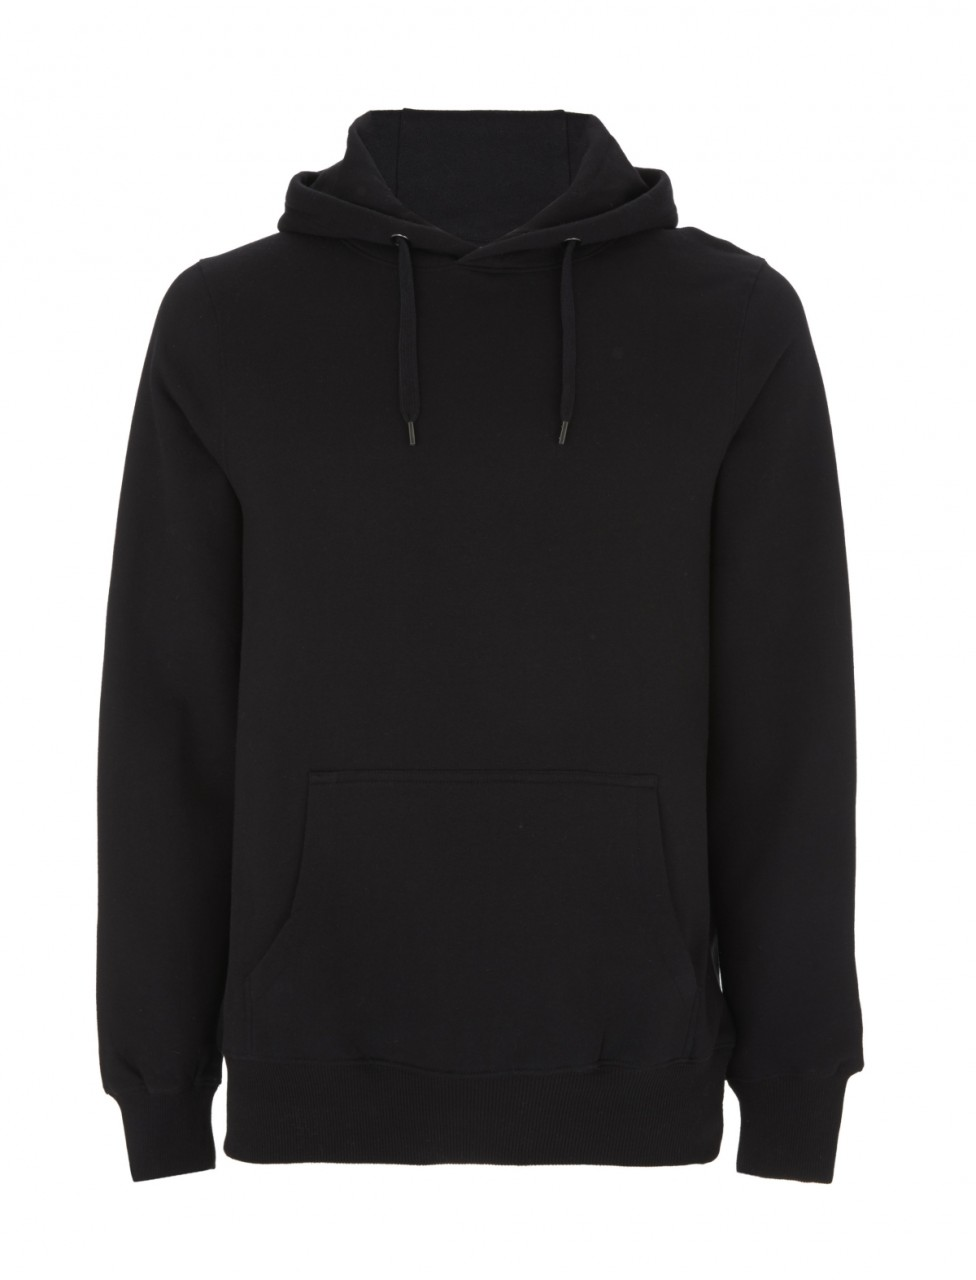 Earth Positive Unisex Pullover Hood black